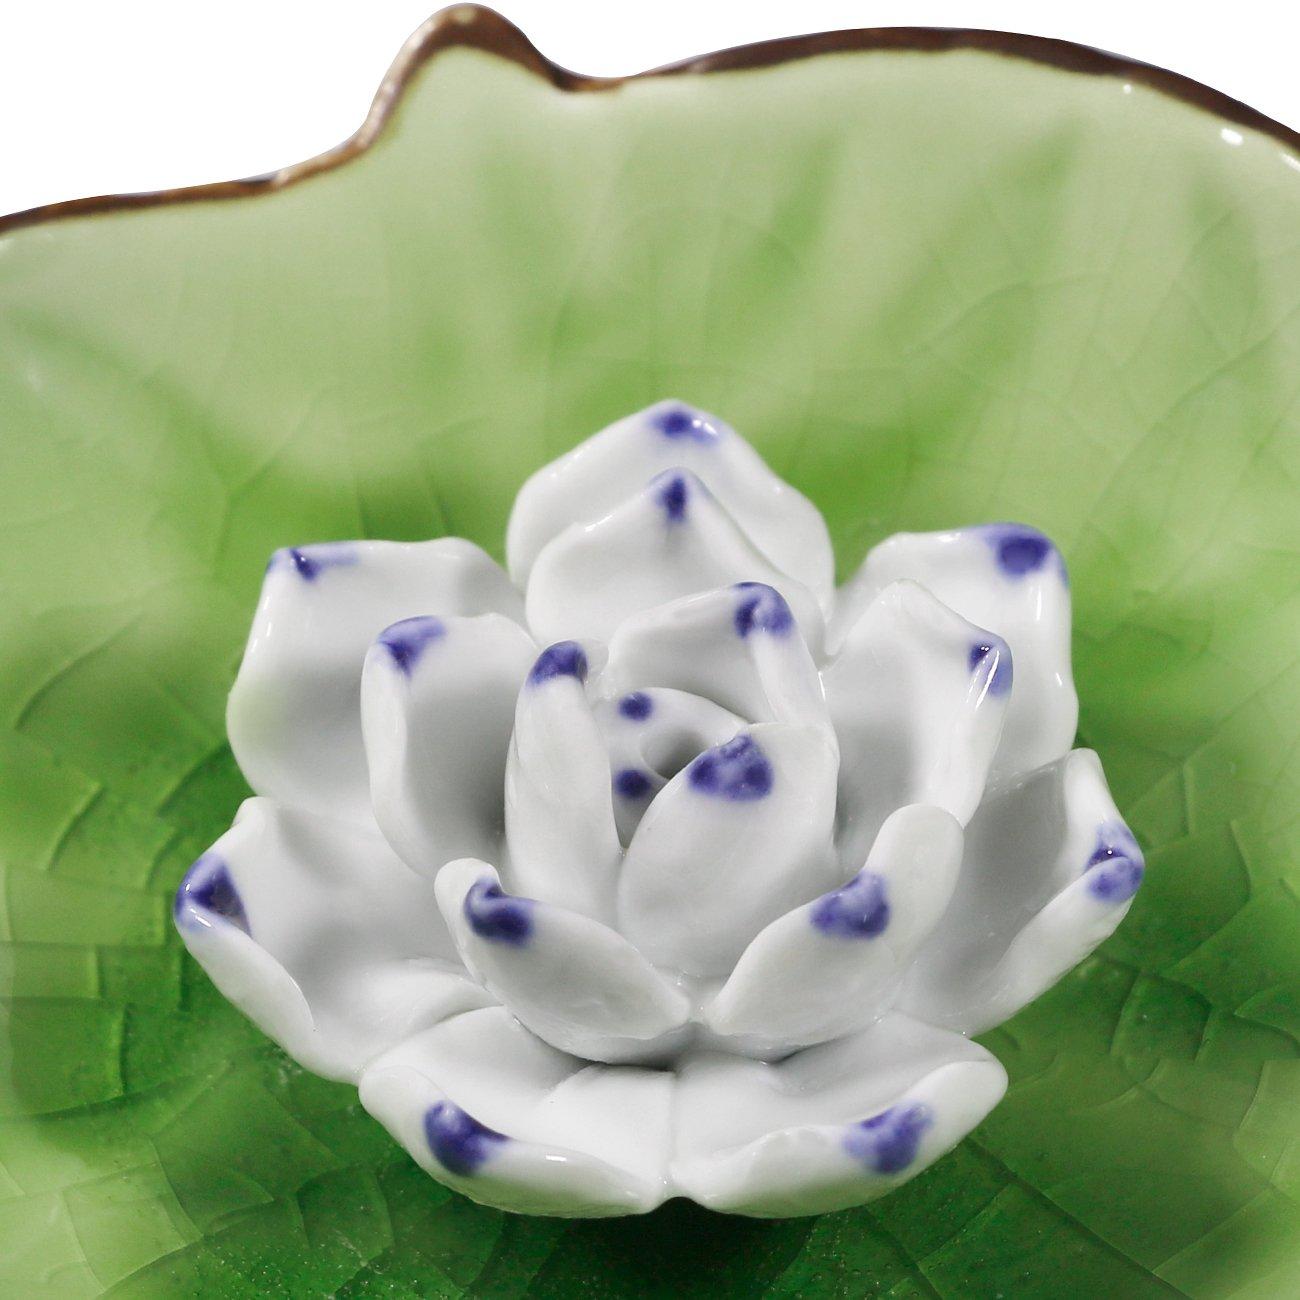 Epfamily incense stick burner holder handmade ceramic lotus flower epfamily incense stick burner holder handmade ceramic lotus flower incense burner bowl ash catcher tray plate izmirmasajfo